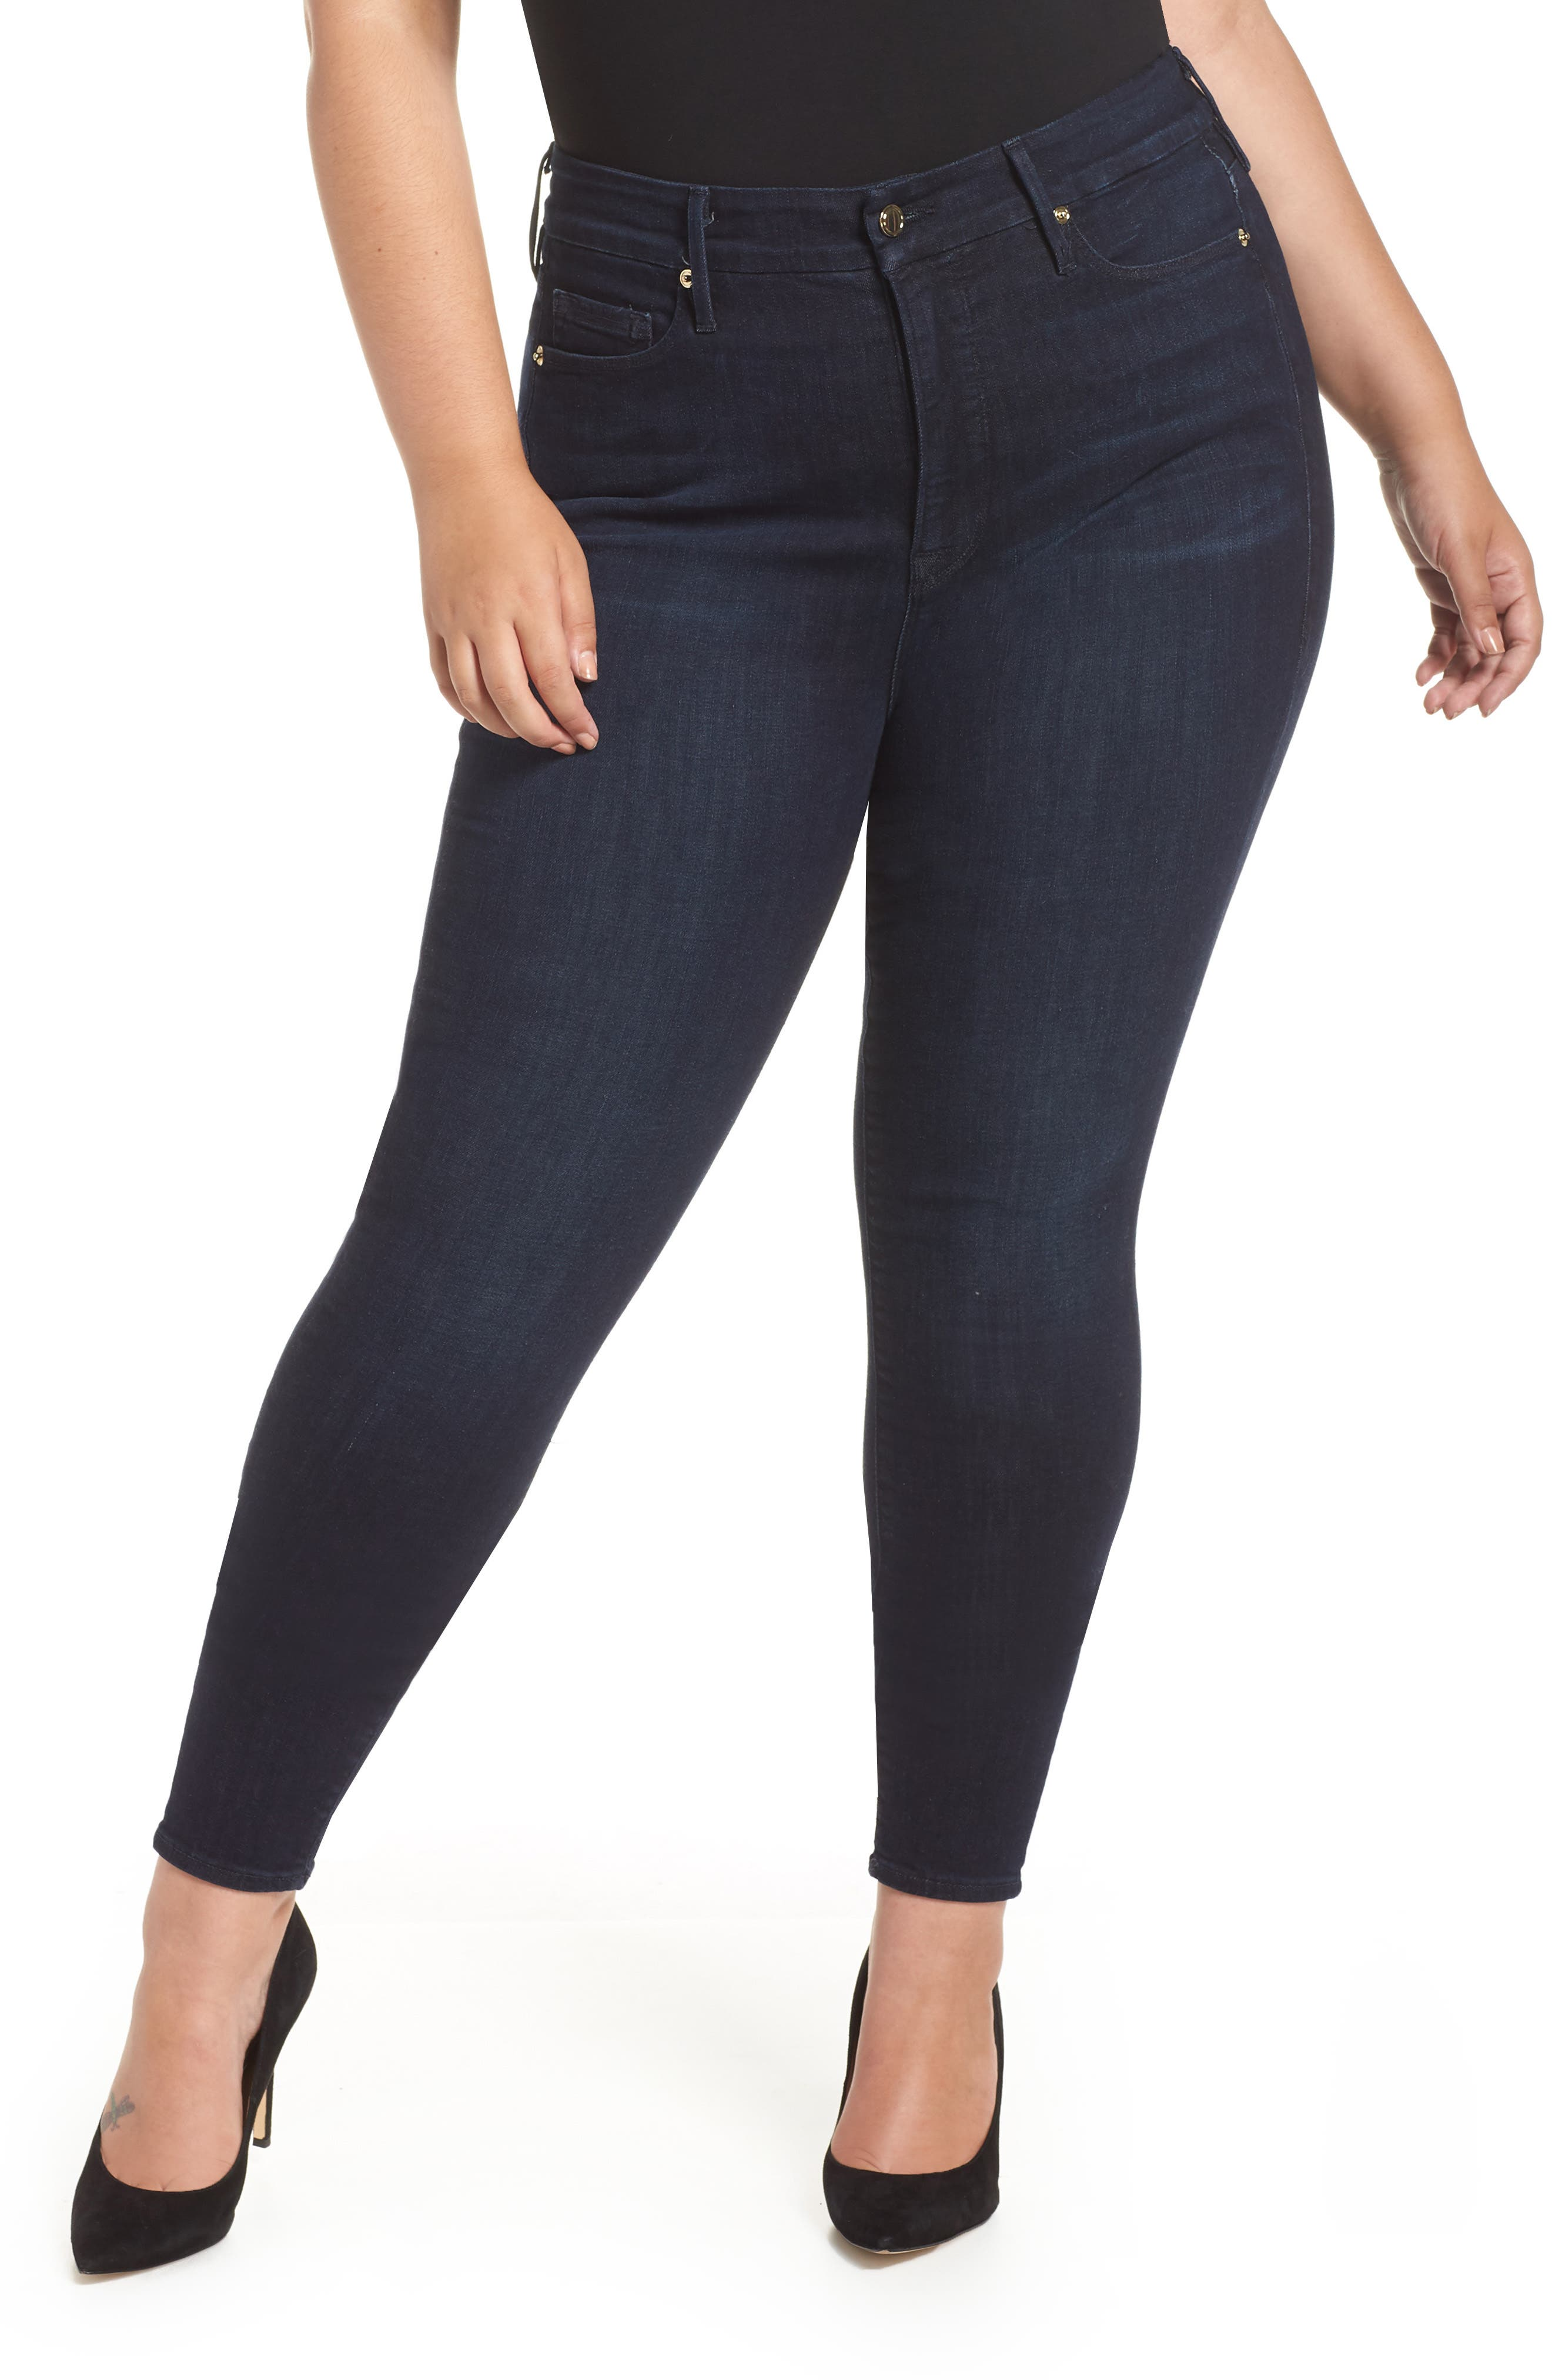 GOOD AMERICAN,                             Good Legs High Waist Skinny Jeans,                             Alternate thumbnail 2, color,                             BLUE224